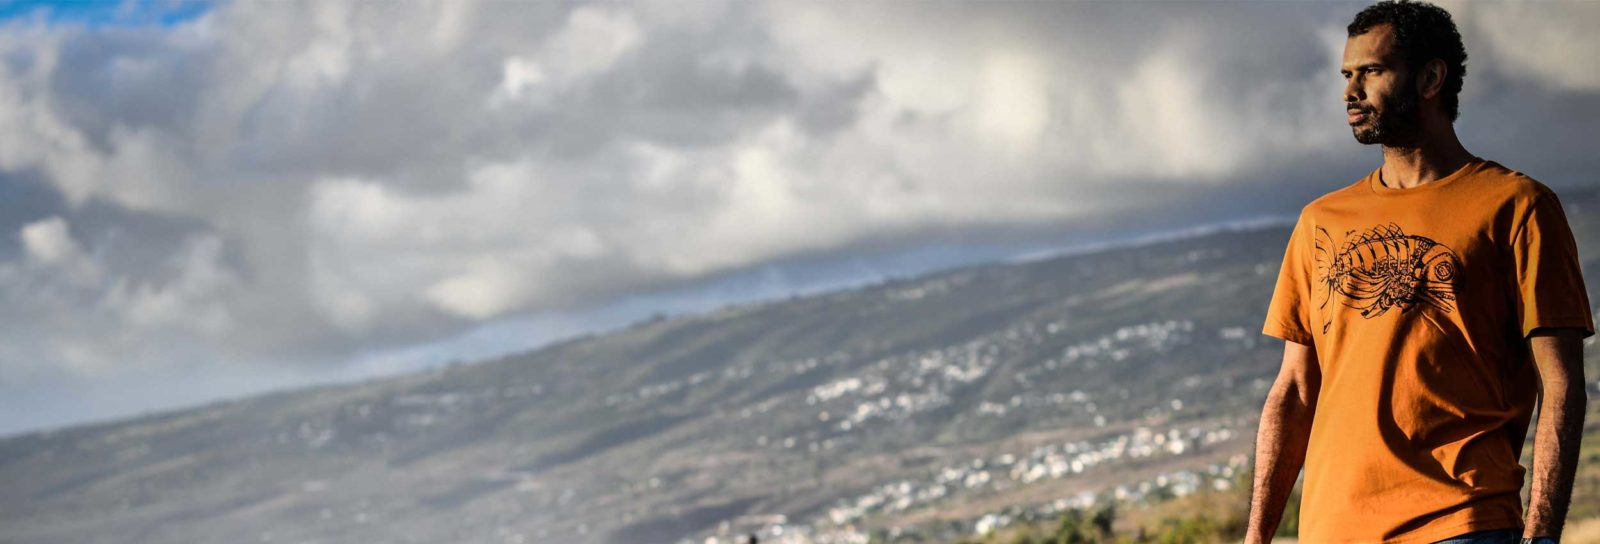 original-bouftang-coton bio équitable saint leu Réunionoriginal-bouftang-coton bio équitable saint leu Réunion